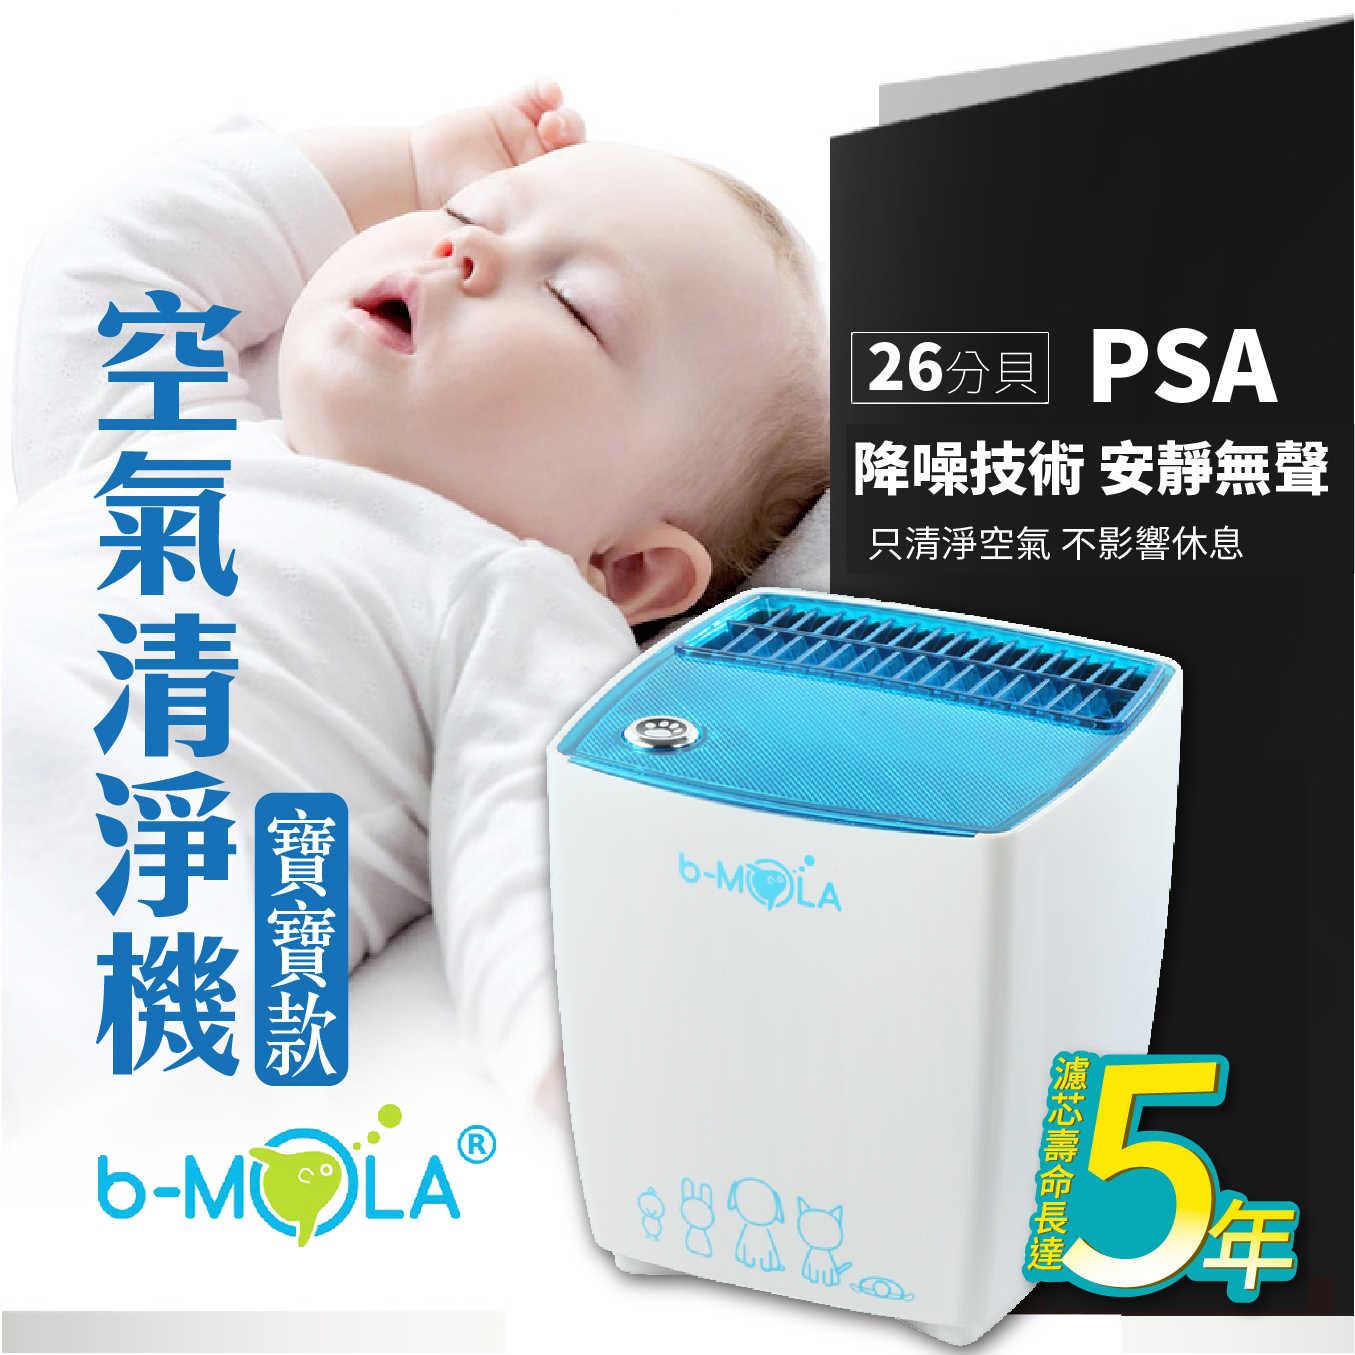 B-MOLA 氧聚解空氣清淨機 PSA